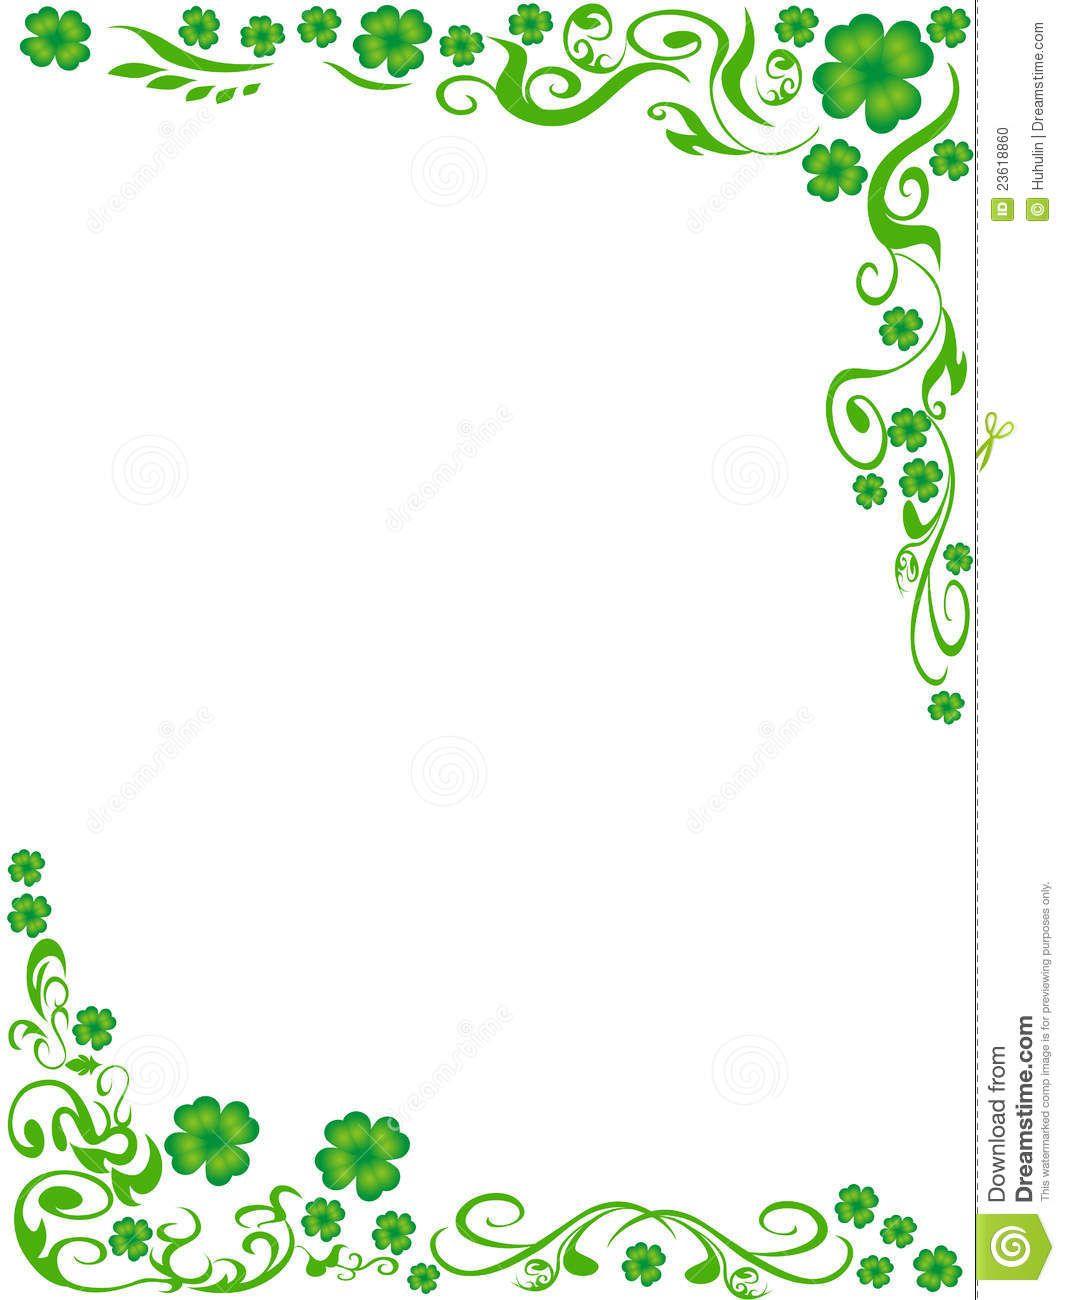 Four Leaf Clover Border Clip Art Ndash 101